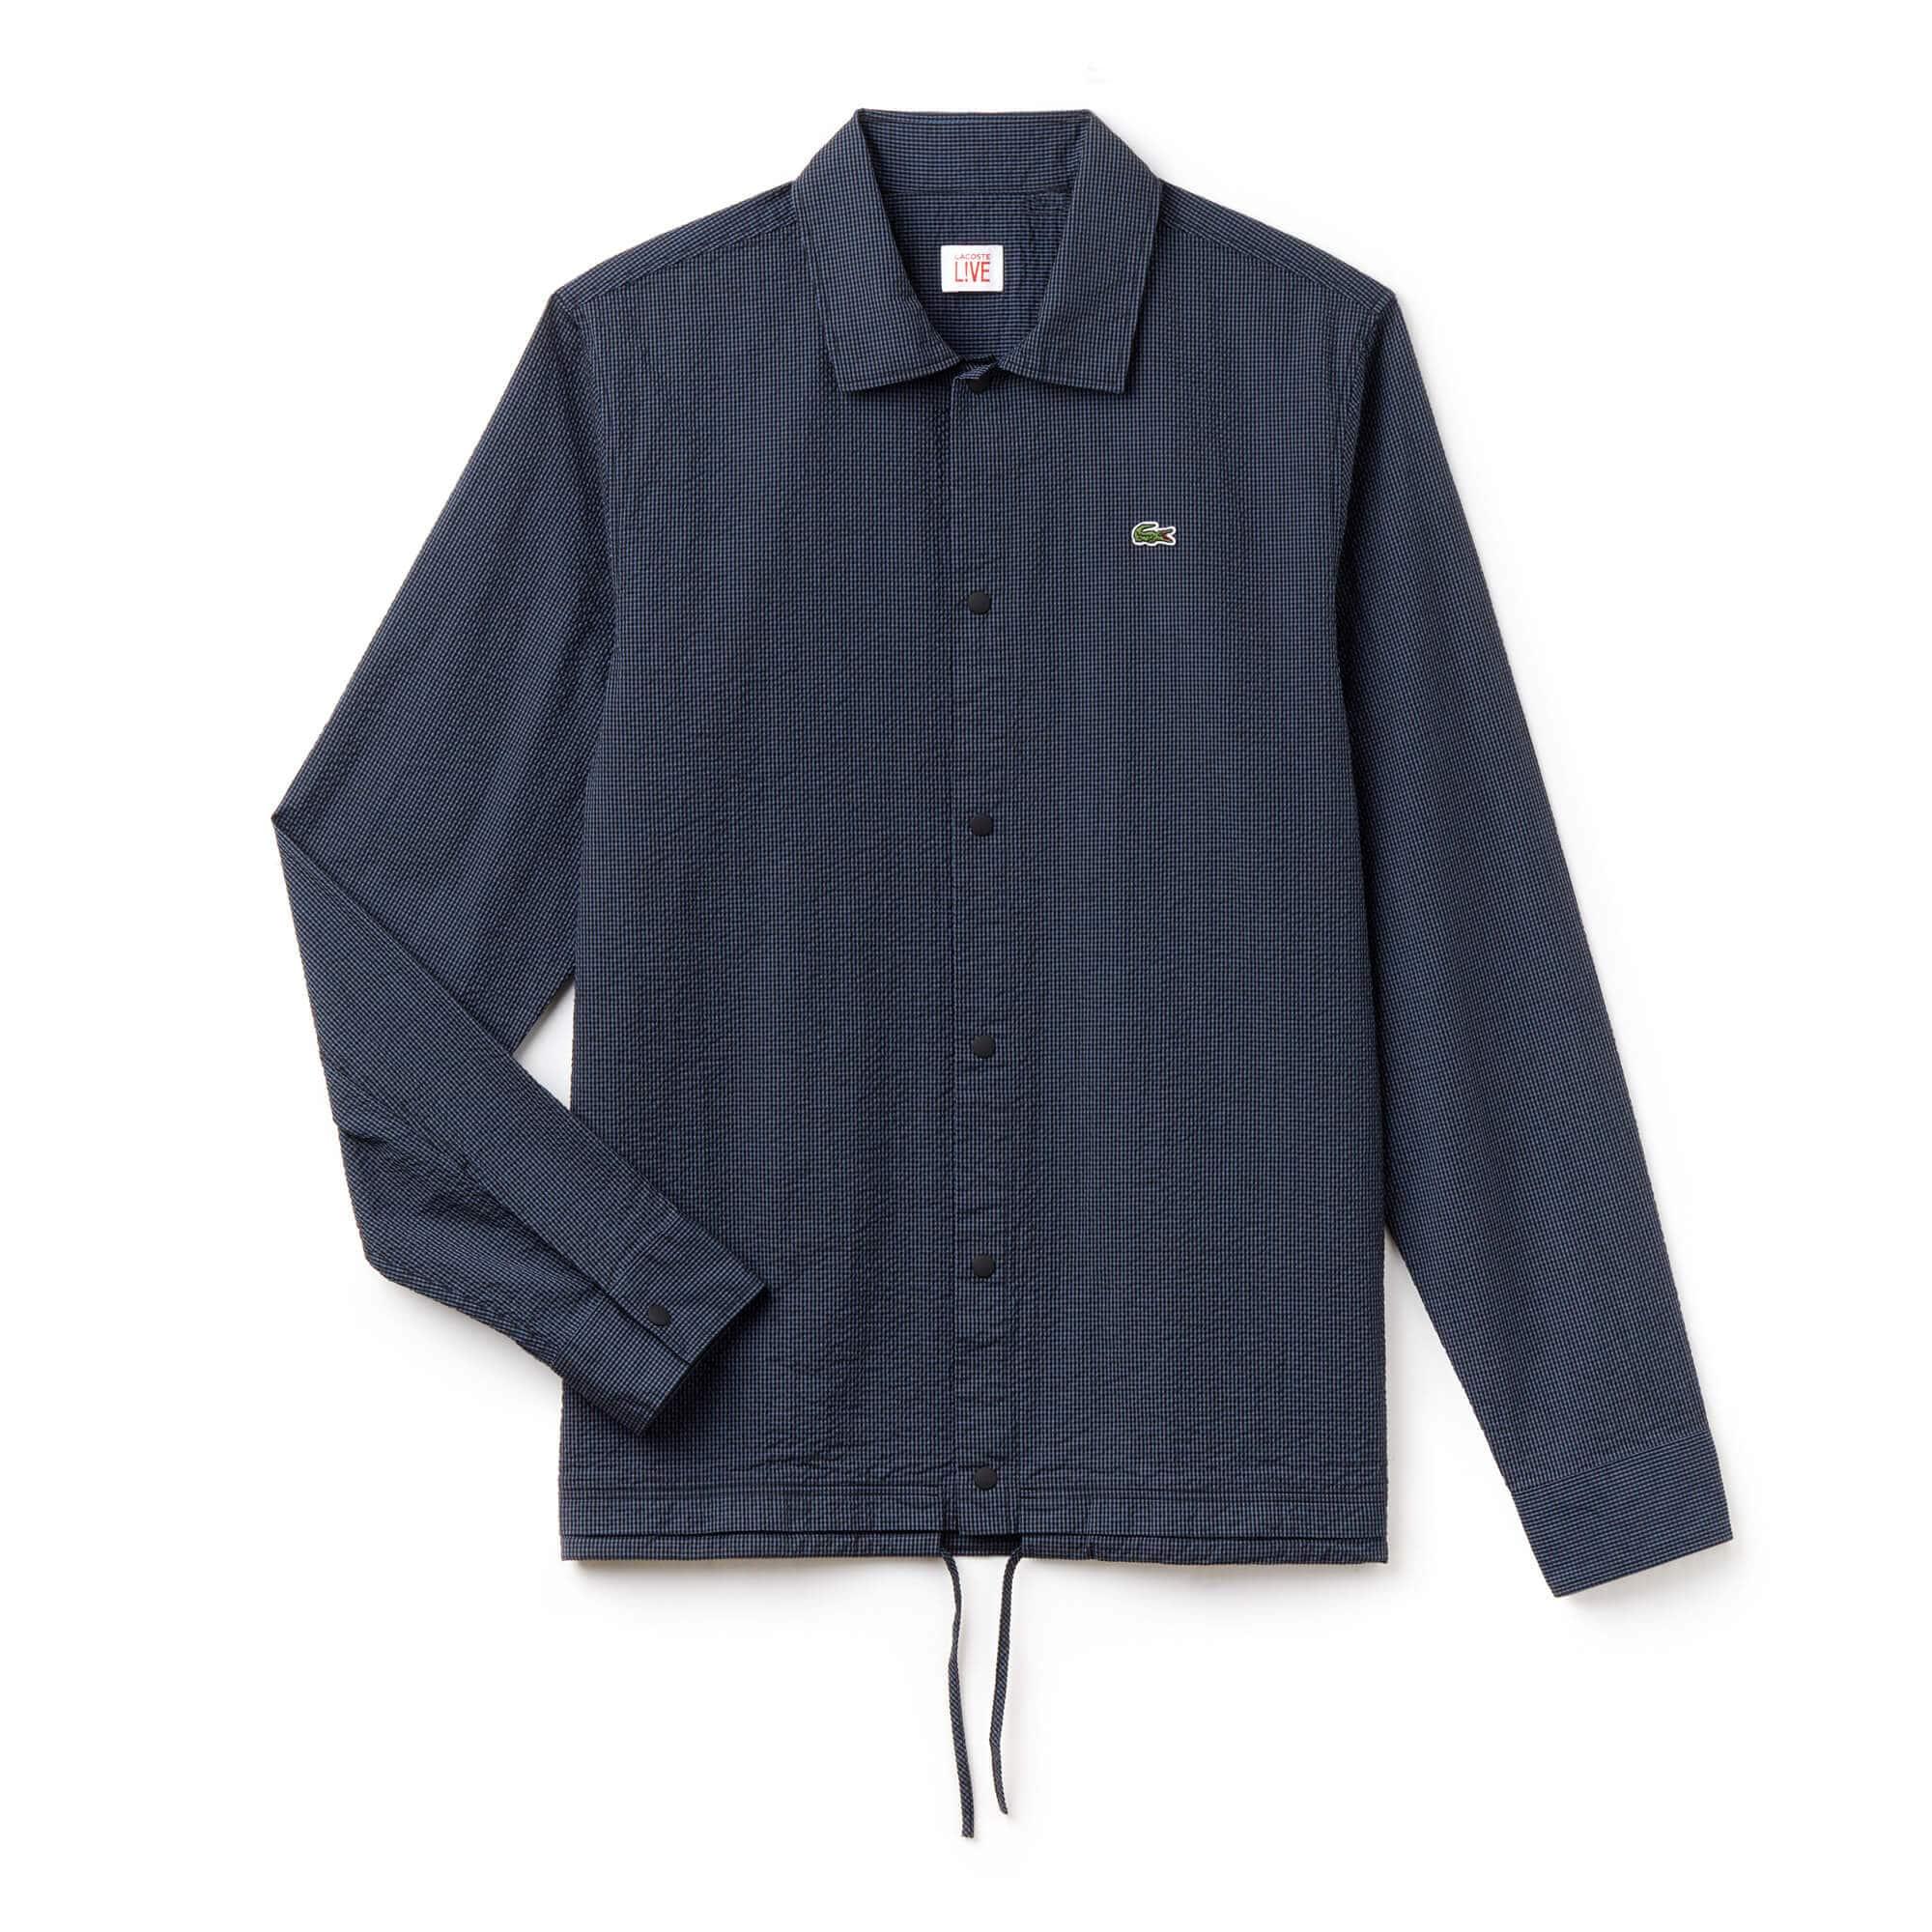 Men's Lacoste LIVE Skinny Fit Gingham Seersucker Shirt